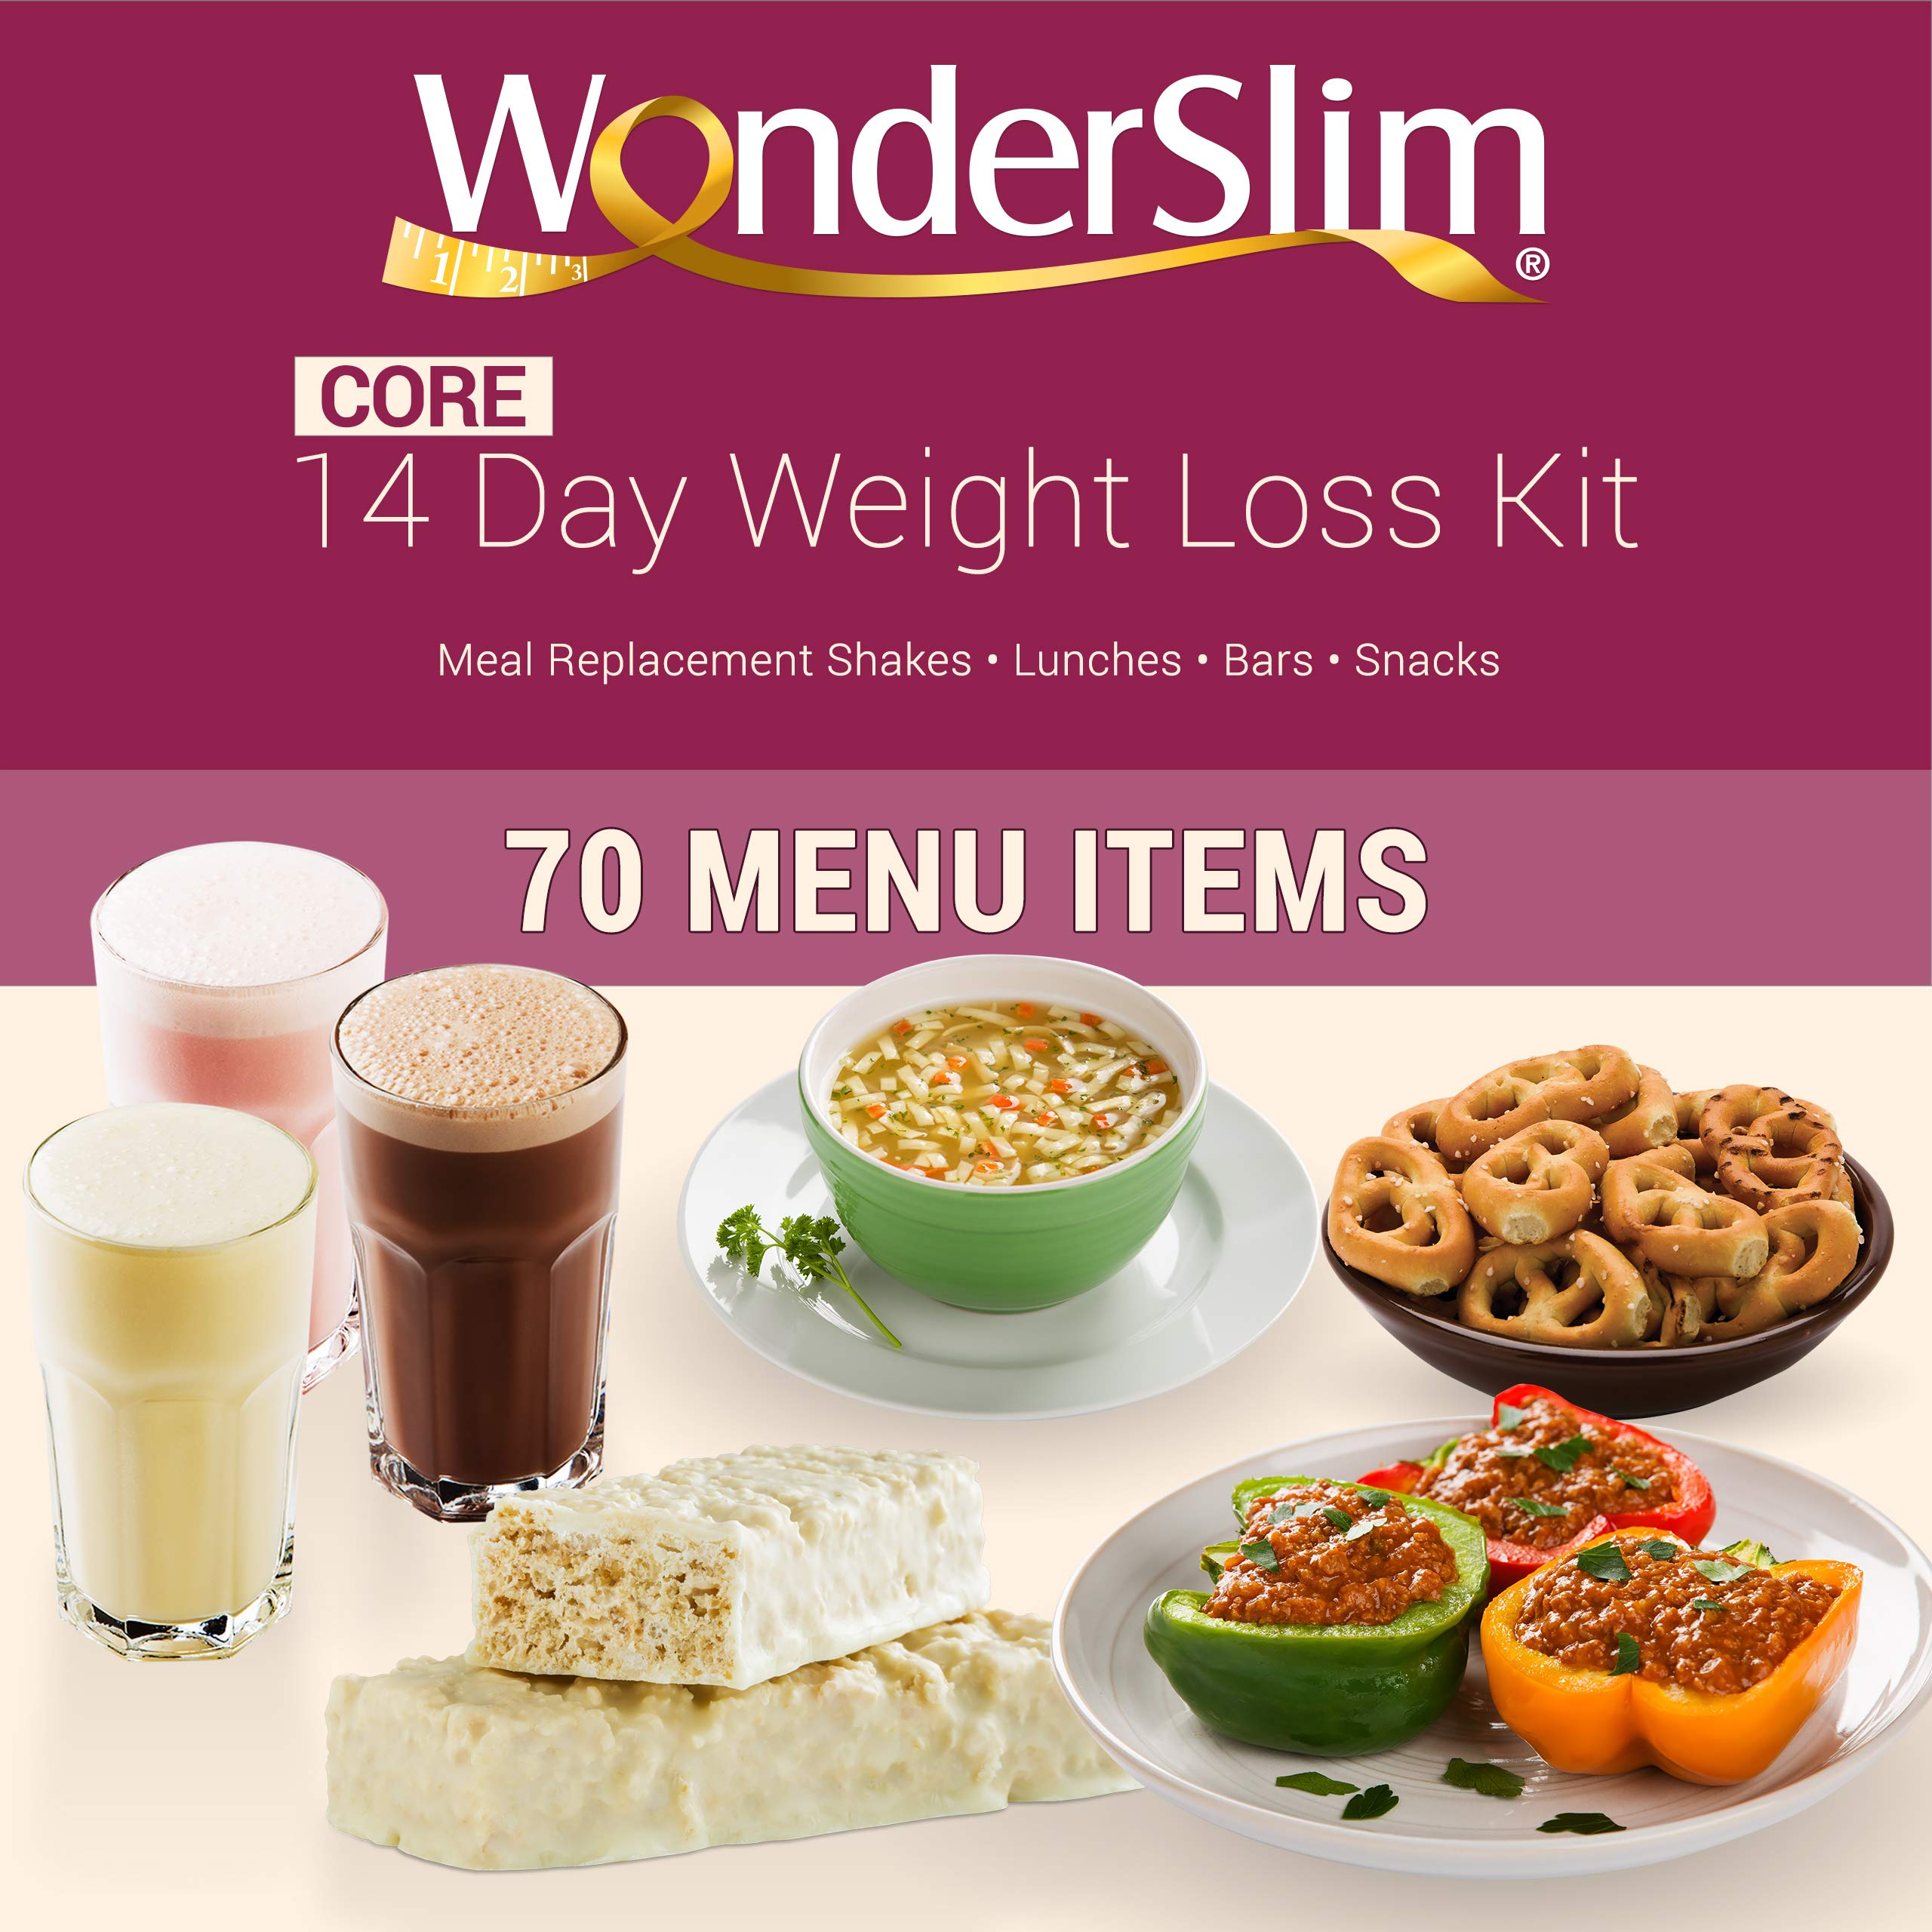 WonderSlim Core 2 Week Diet Kit - Complete Weight Loss Package - Meal Replacements, Protein Supplements, Snacks and Lifestyle Guide by WonderSlim (Image #1)